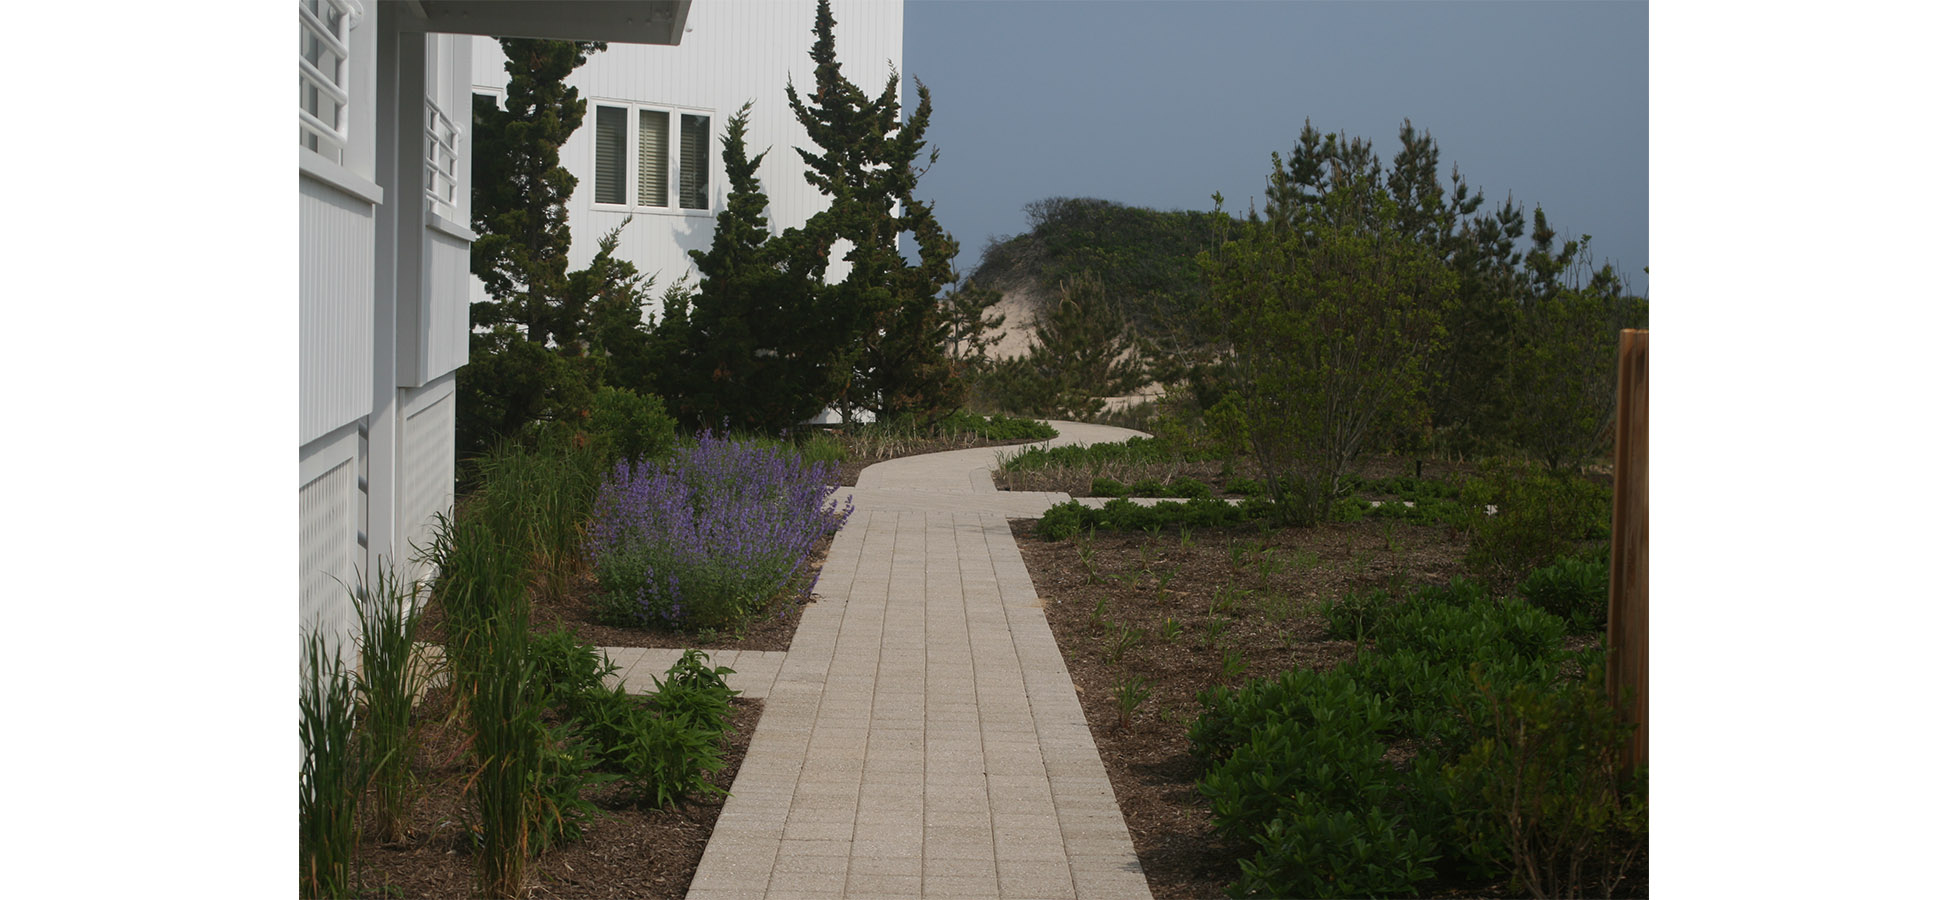 Pathway - edited.jpg